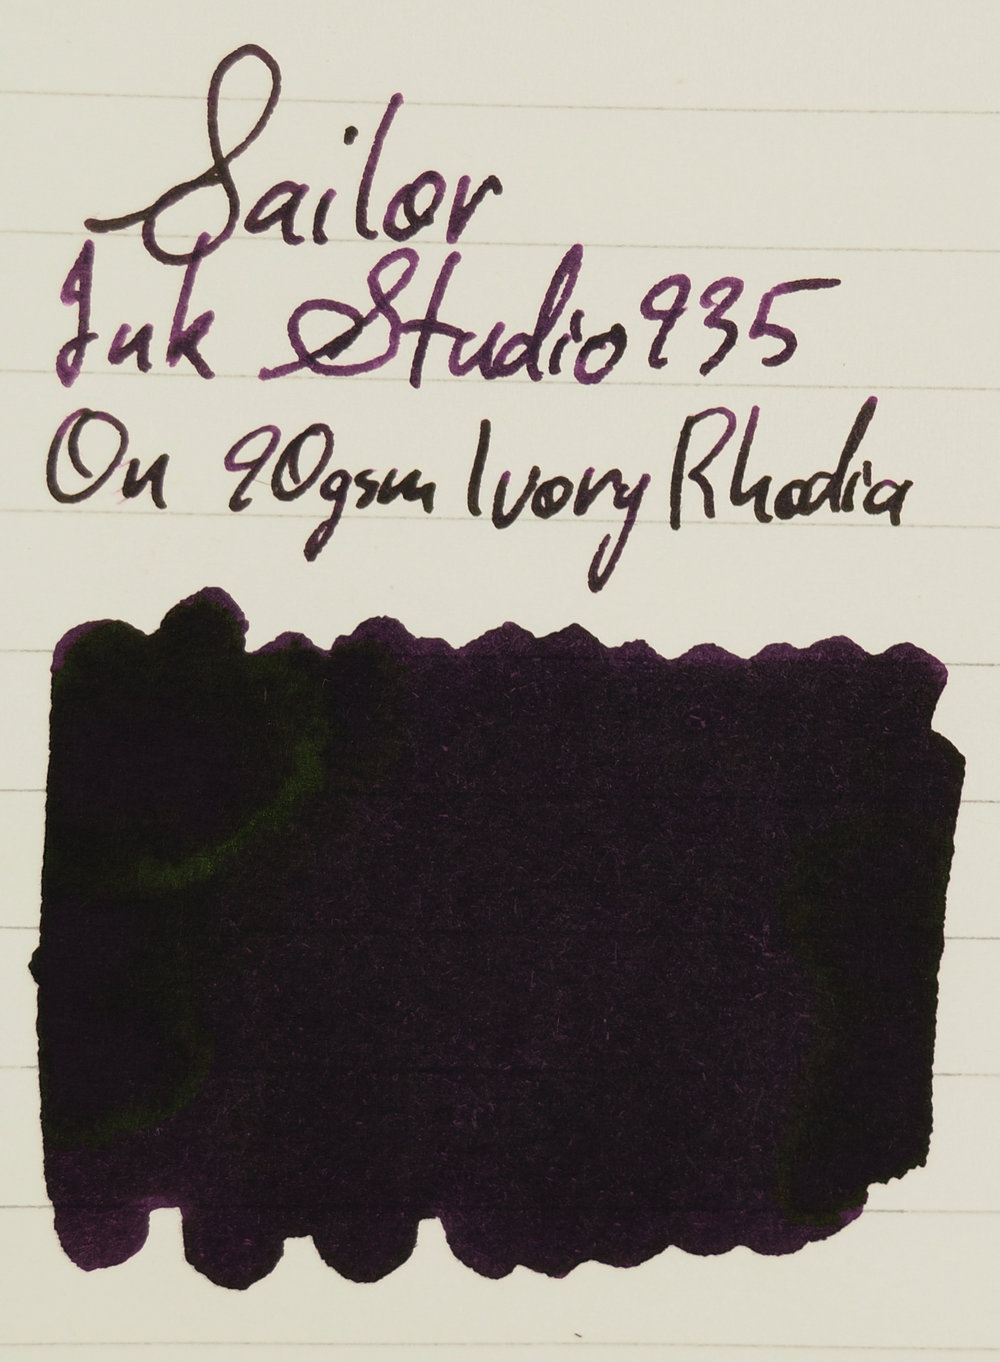 Paper 90gsm Ivory Rhodia.jpg